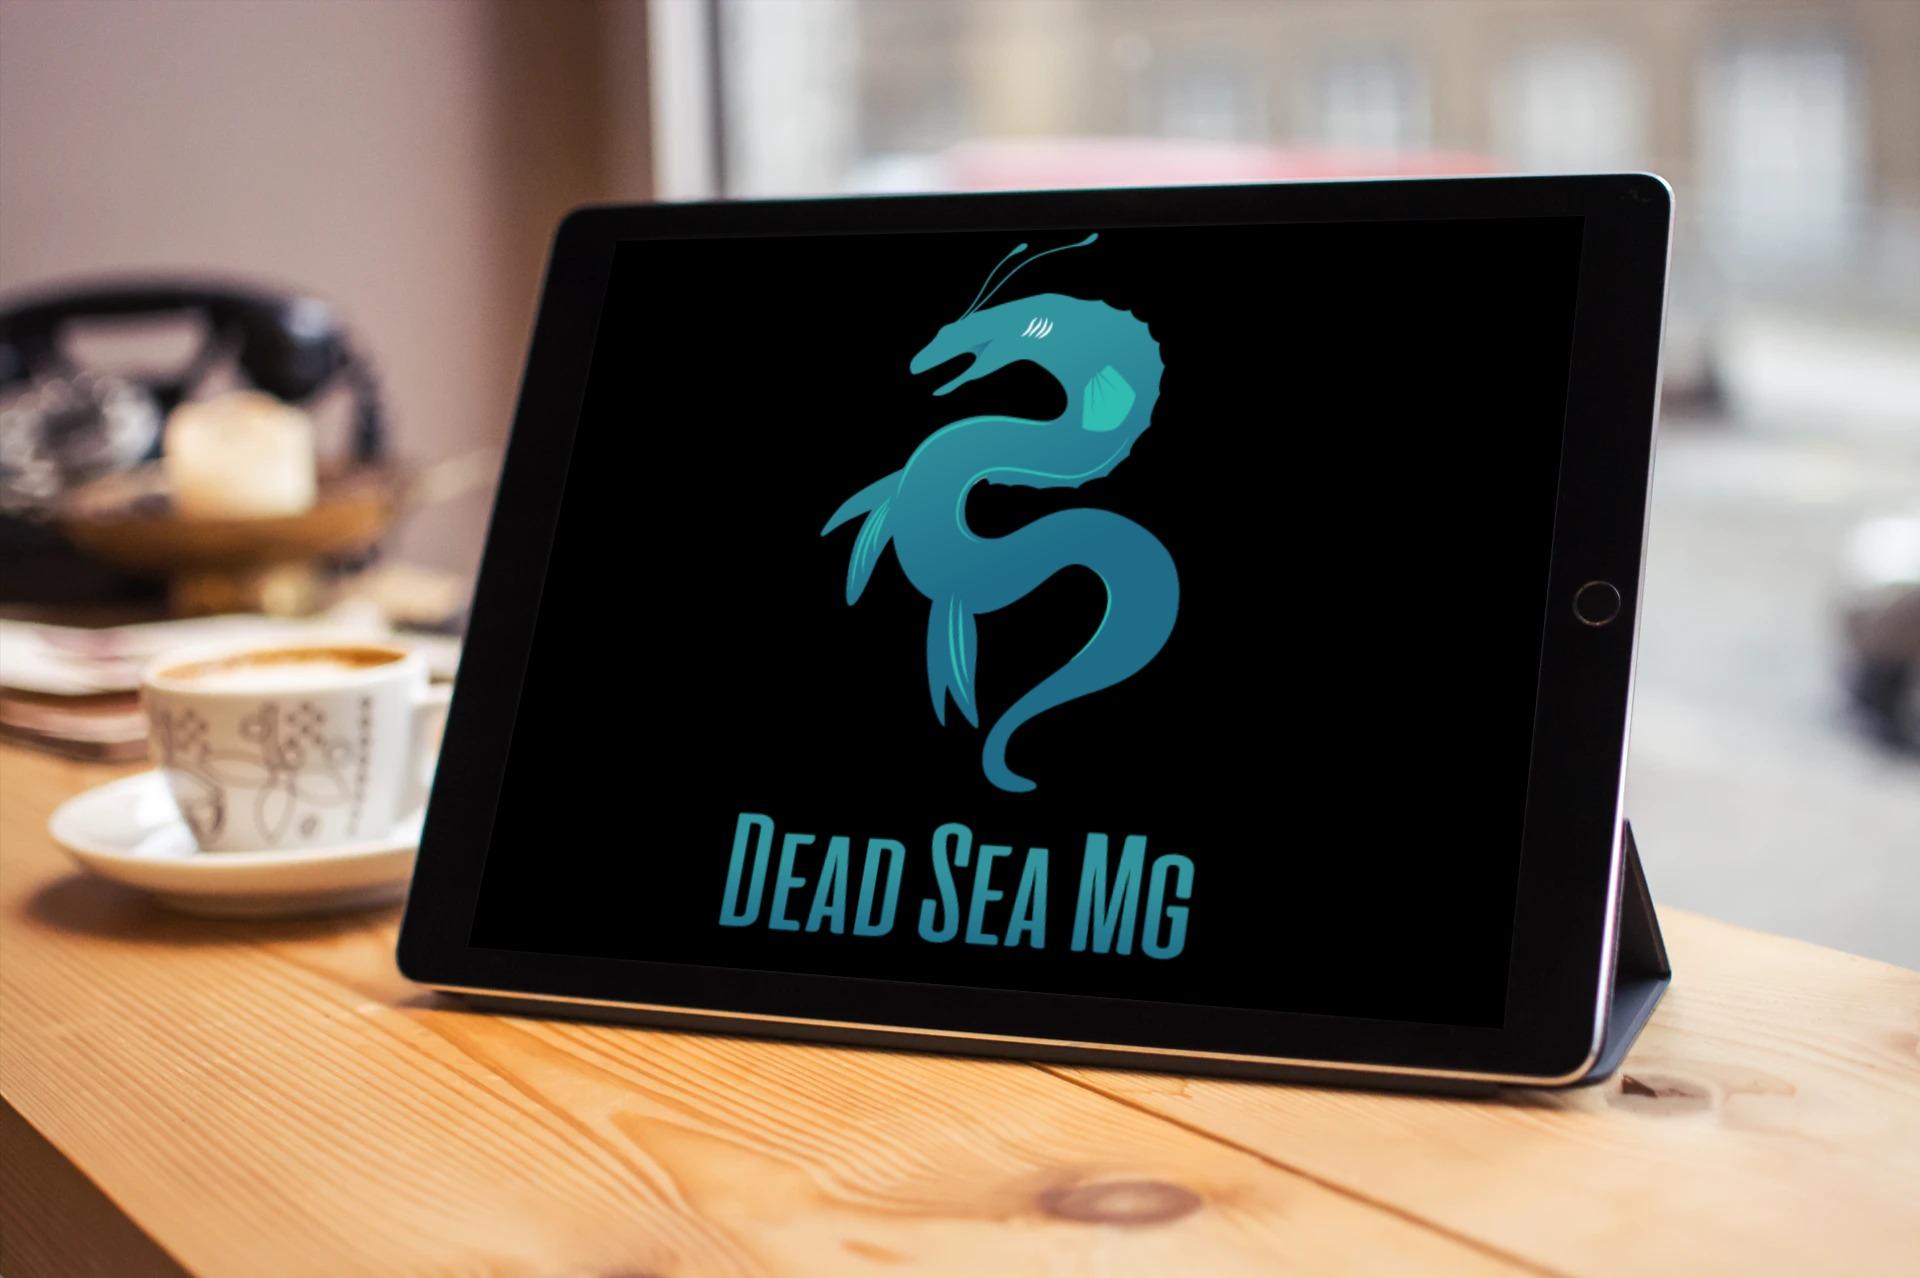 Dead Sea MG logo